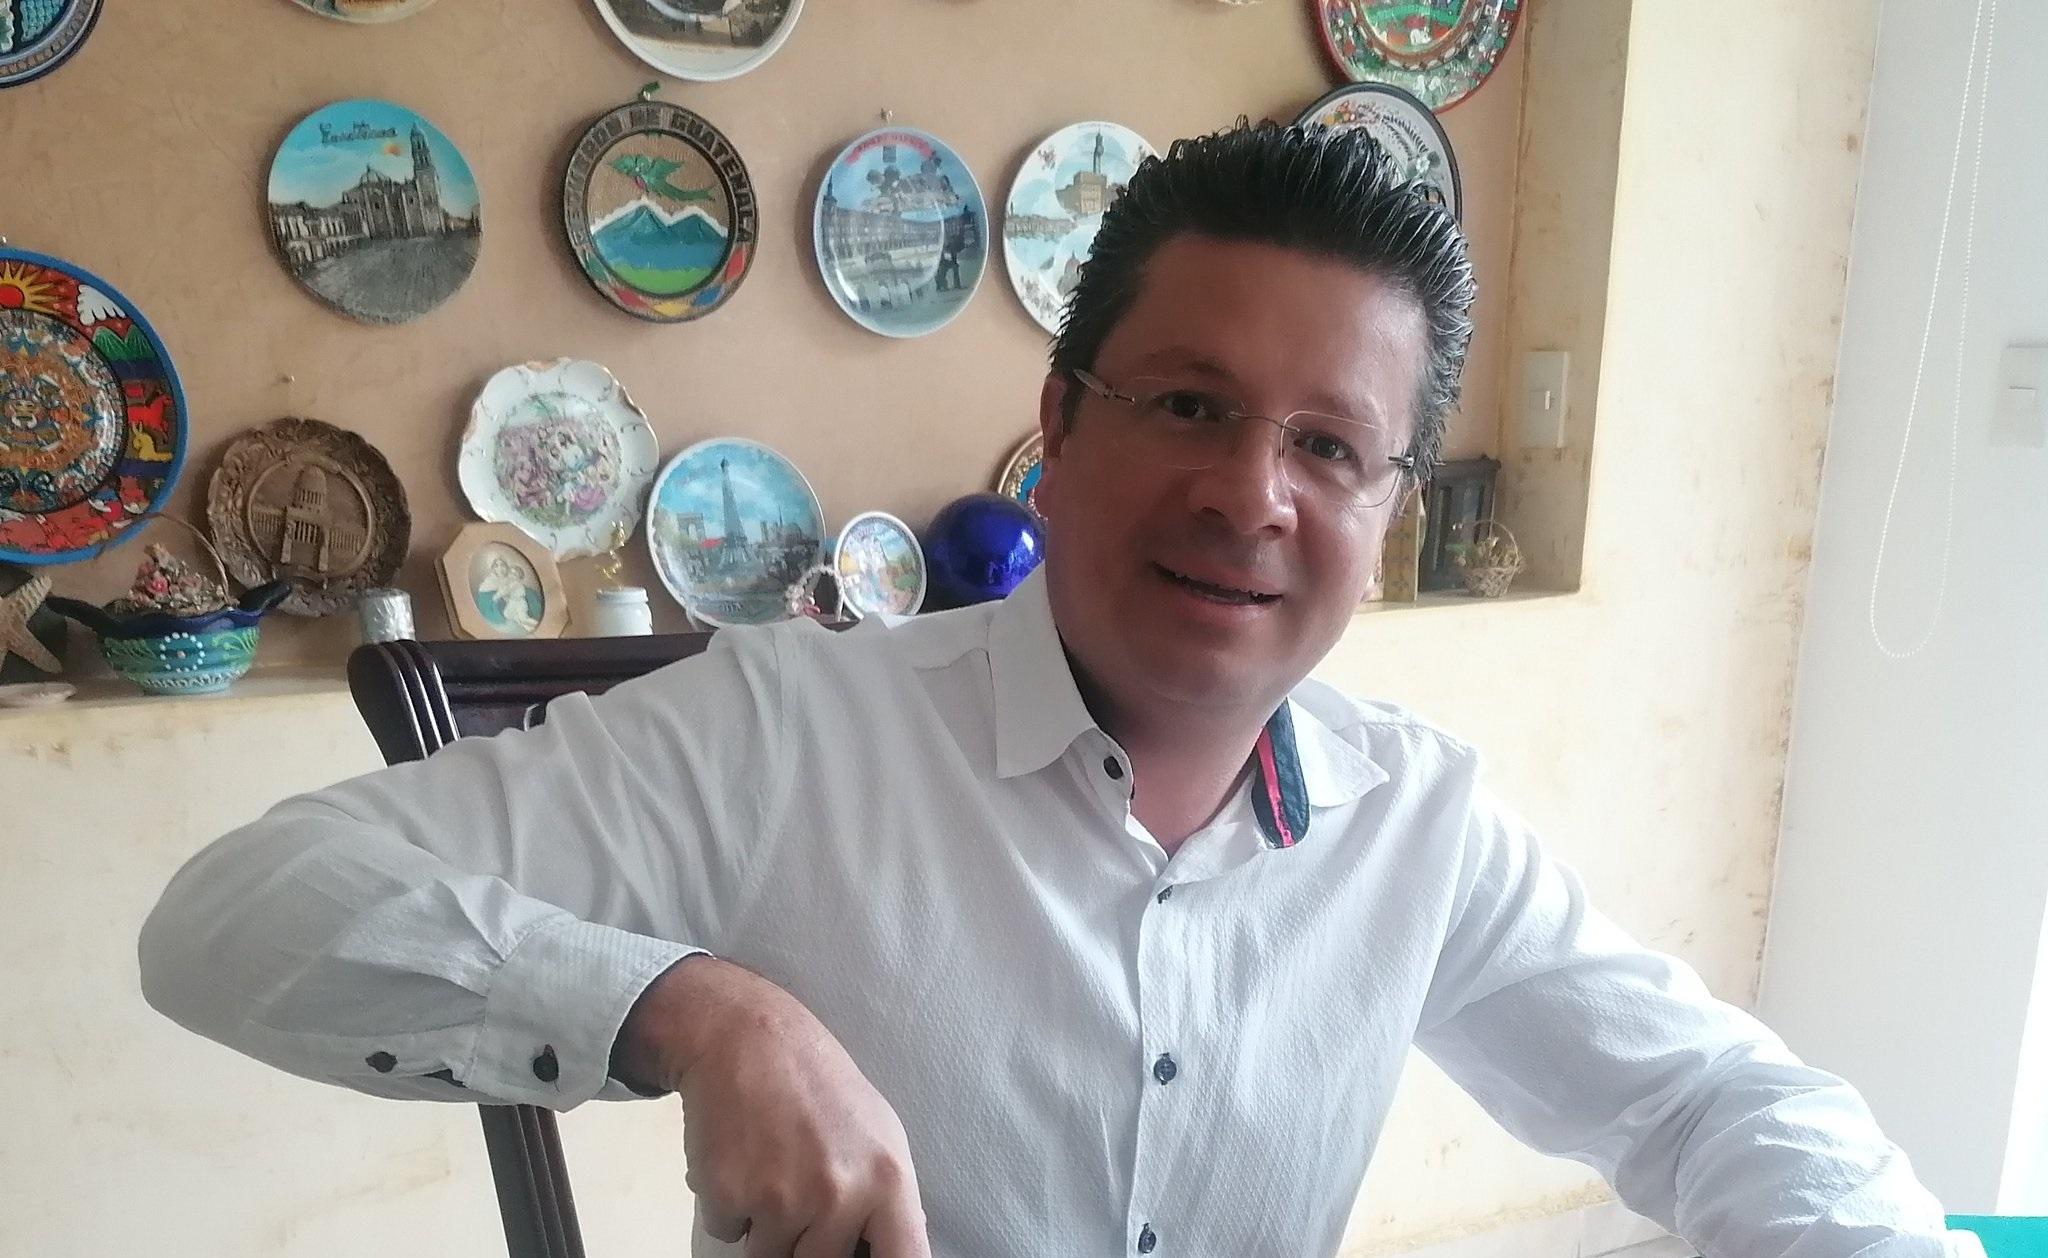 Denuncias contra Lorenzini son campaña negra: consejera de Morena